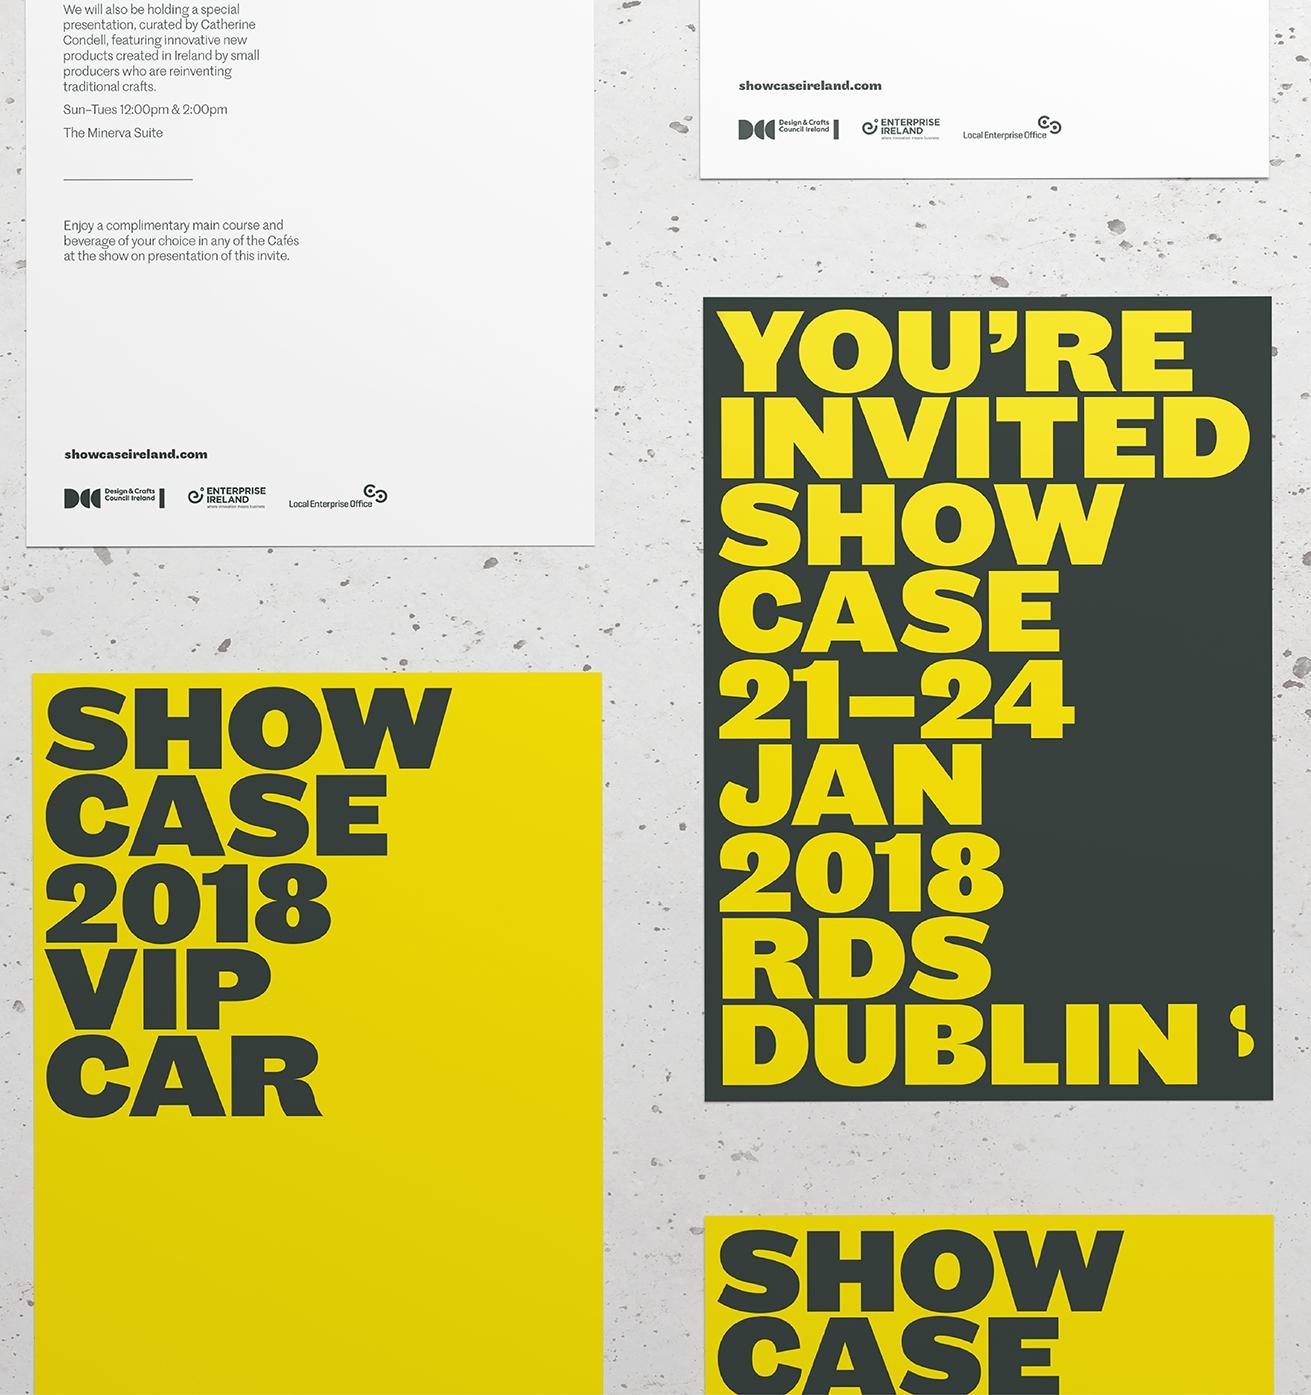 TogtherWeCreate_Showcase18_Invite.jpg